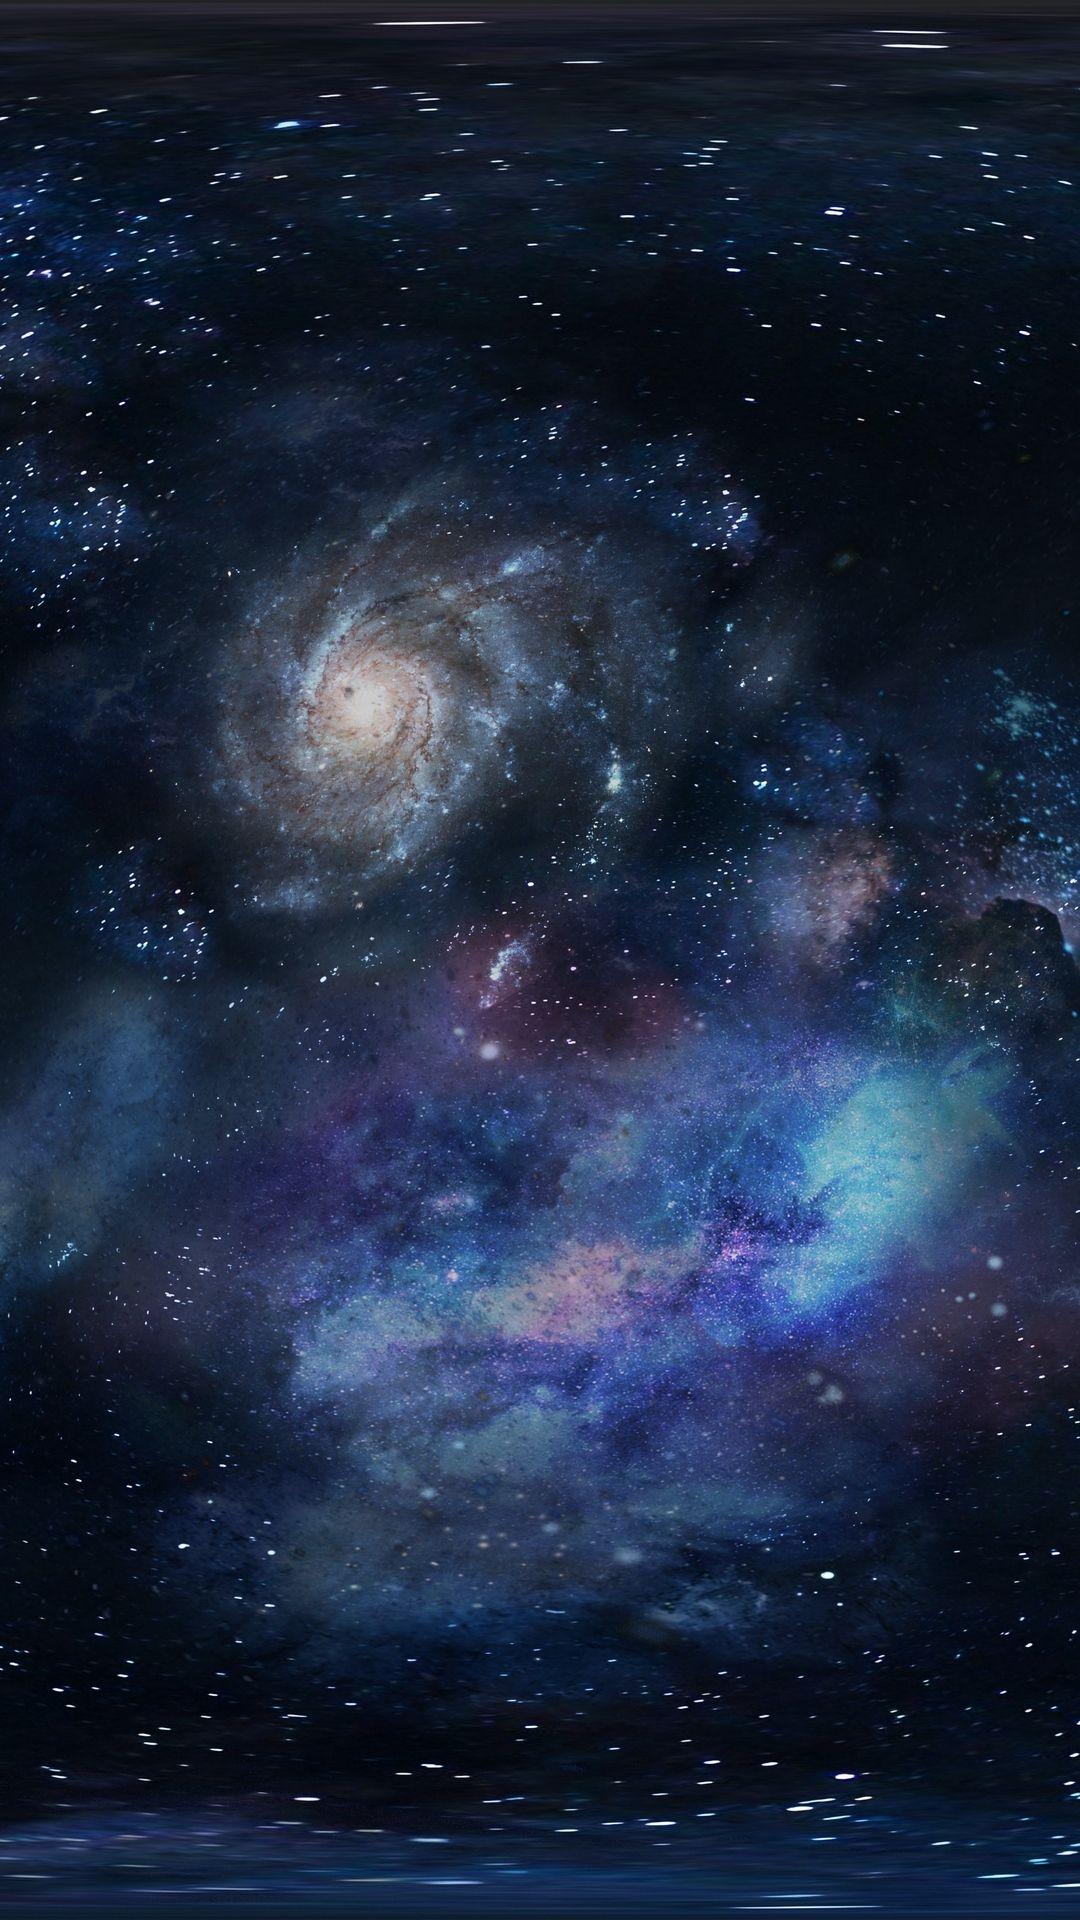 Galaxy Space Iphone Background 2020 宇宙 壁紙 宇宙 壁紙